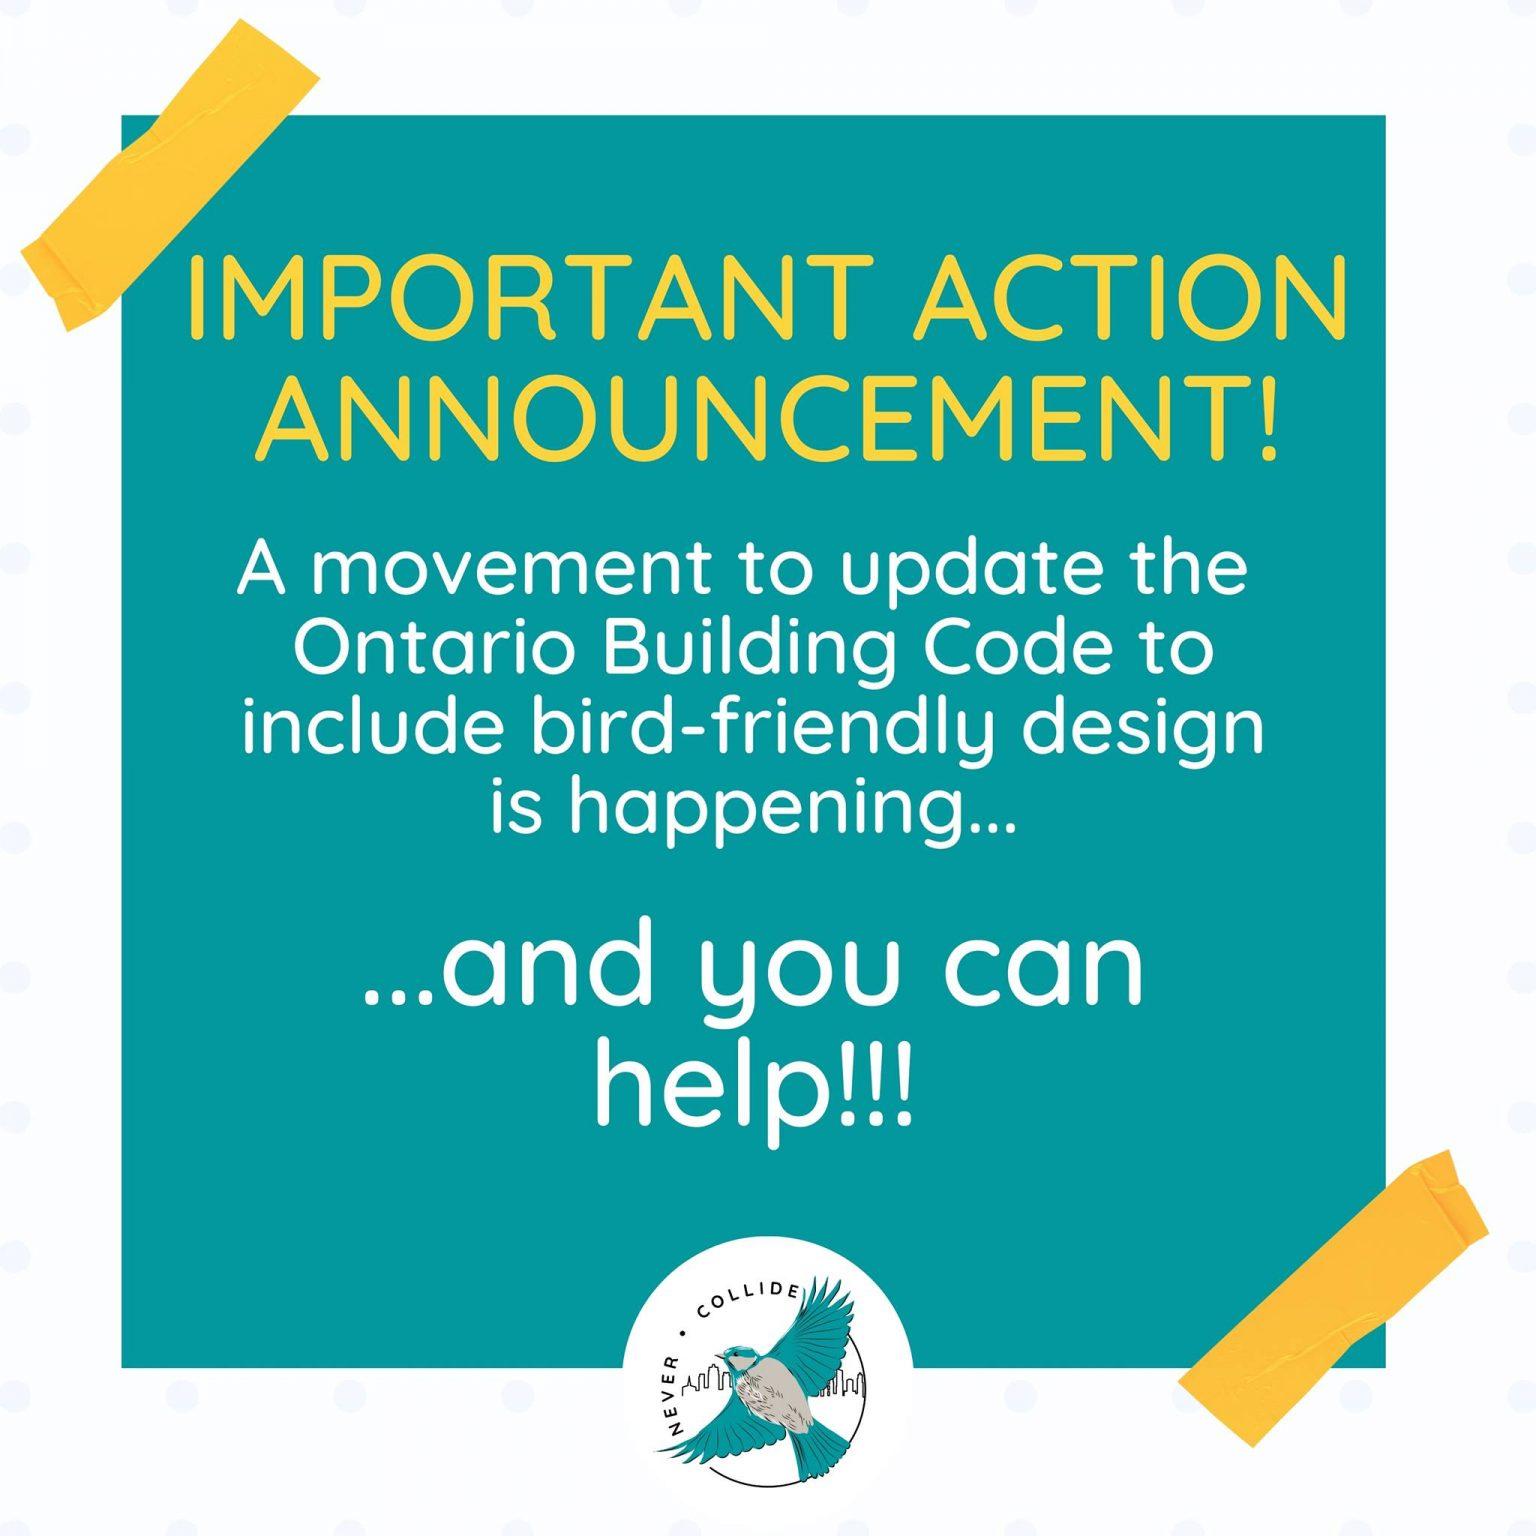 https://www.chrisglovermpp.ca/protect_migratory_birds?fbclid=IwAR3CDW-ulXdjHV62lL_mQHjiExdVPyXSKN-5YmdFaTQ3kKWlcYv3L5sWCgE